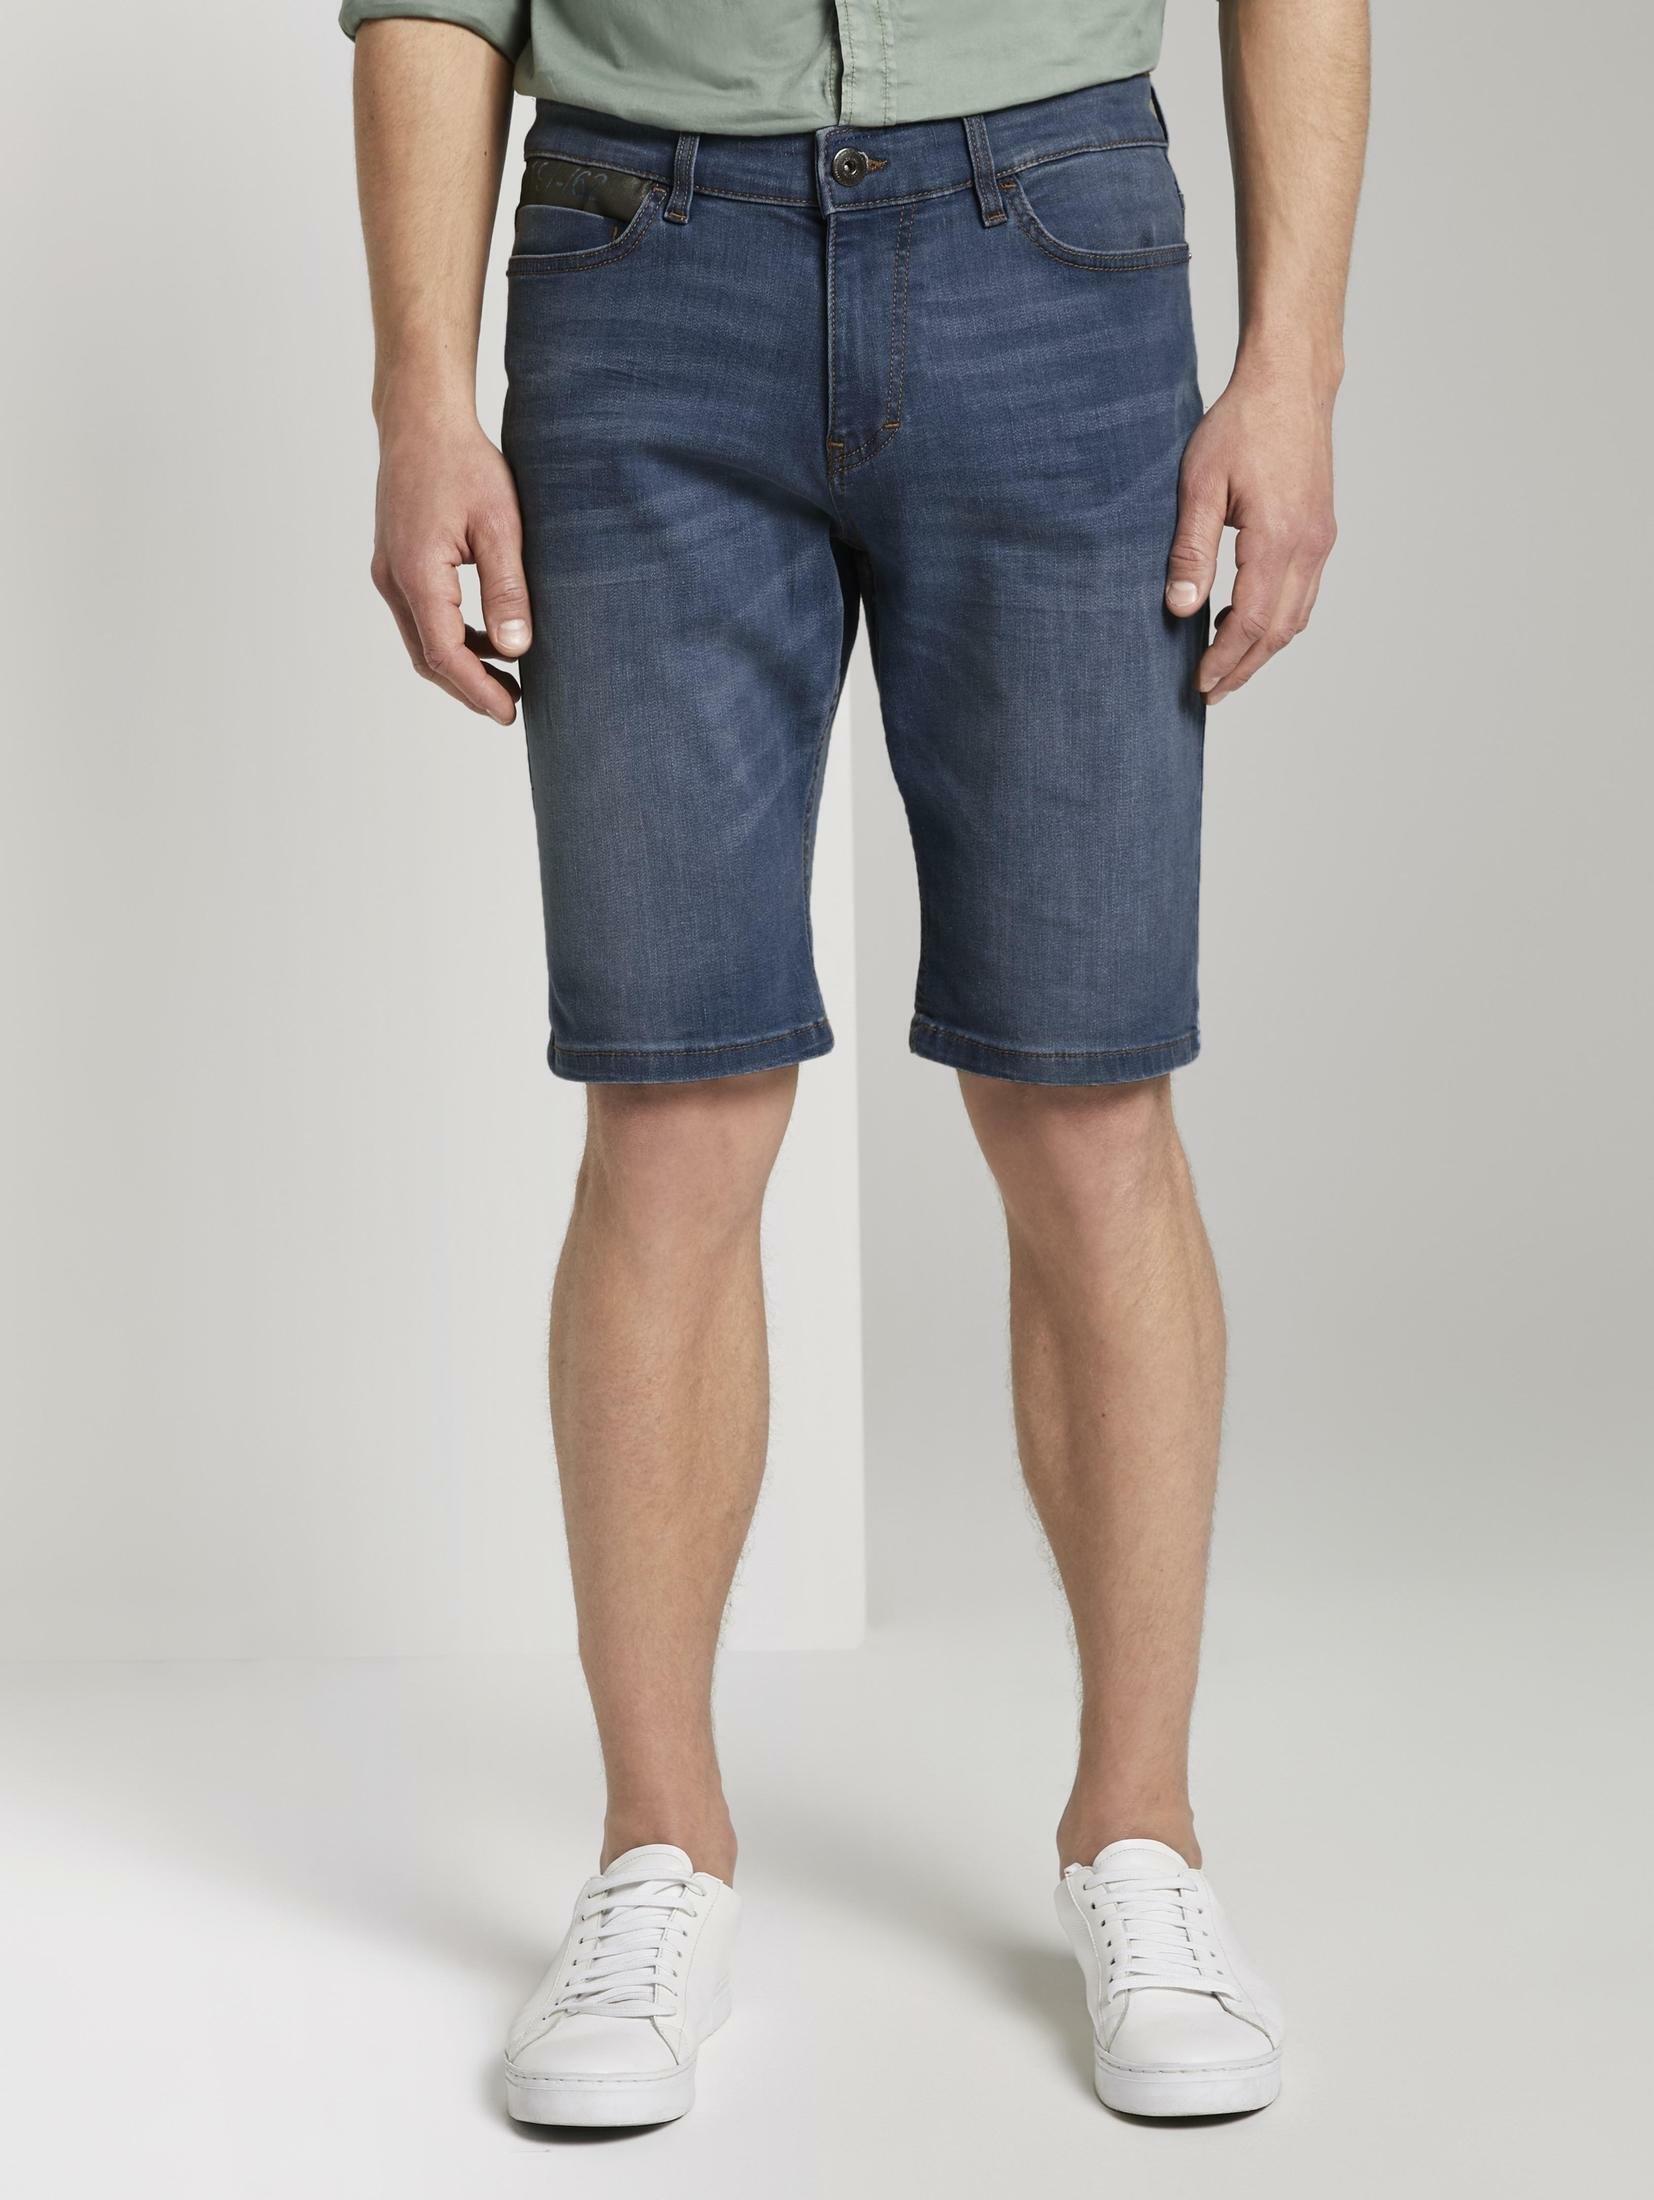 TOM TAILOR jeansshort »Josh Regular Slim Jeans-Shorts mit Superstretch« voordelig en veilig online kopen